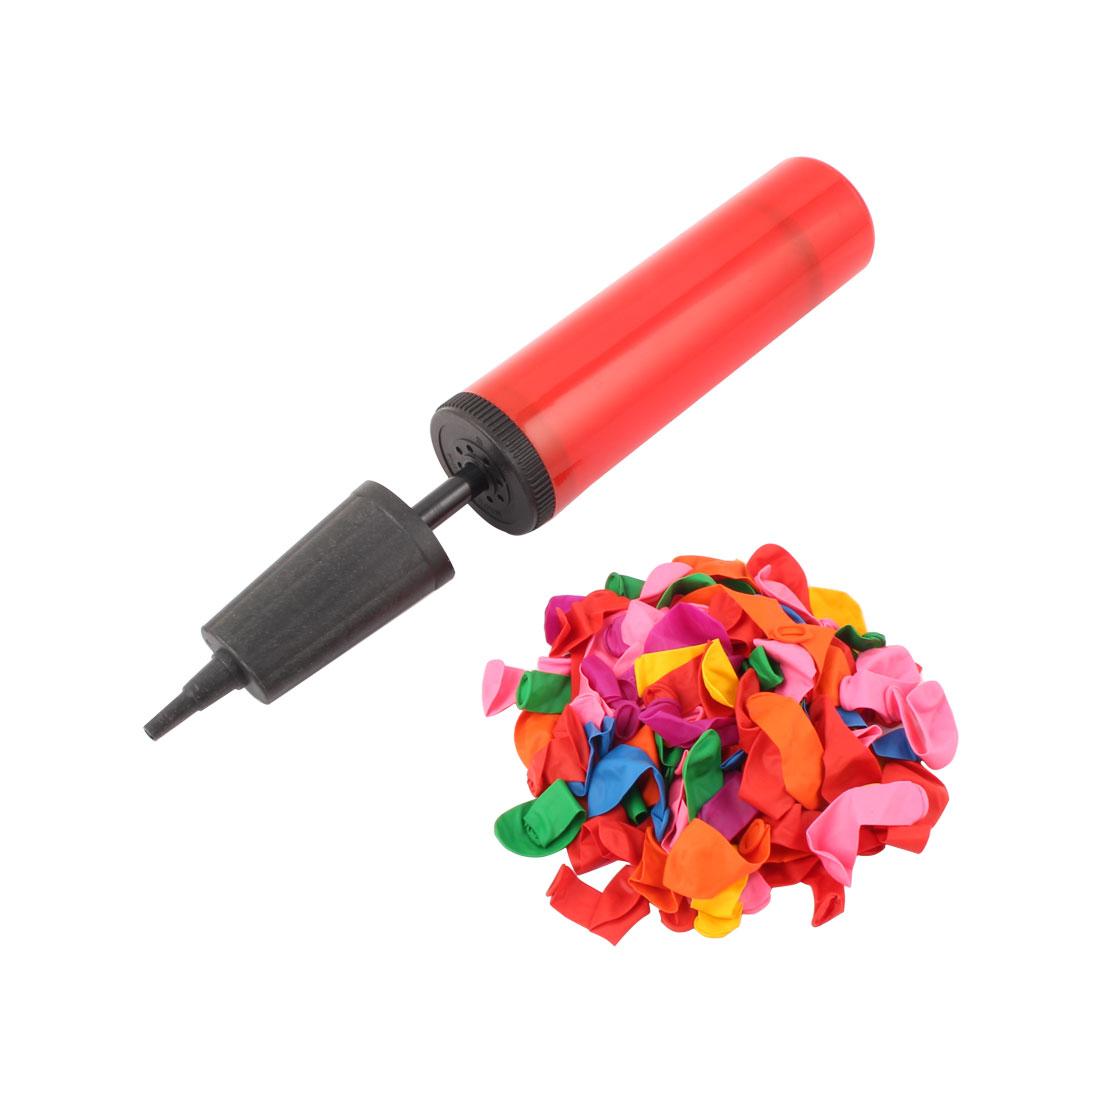 100 PCS Latex Small Balloons + Pump Hand Held Inflator